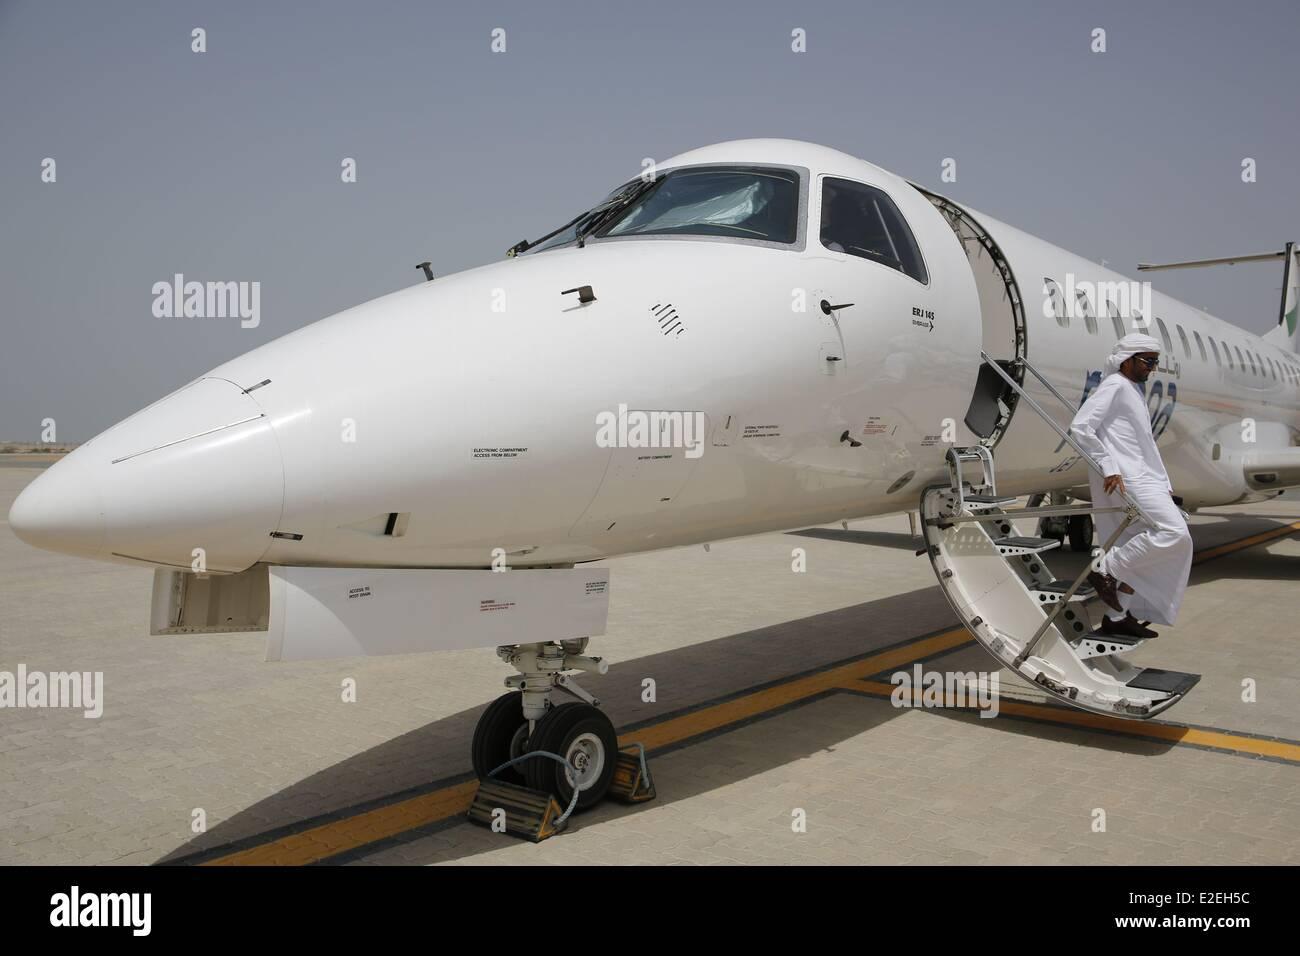 Jet Privato Emirates : Emirates private jet uniform pustcha